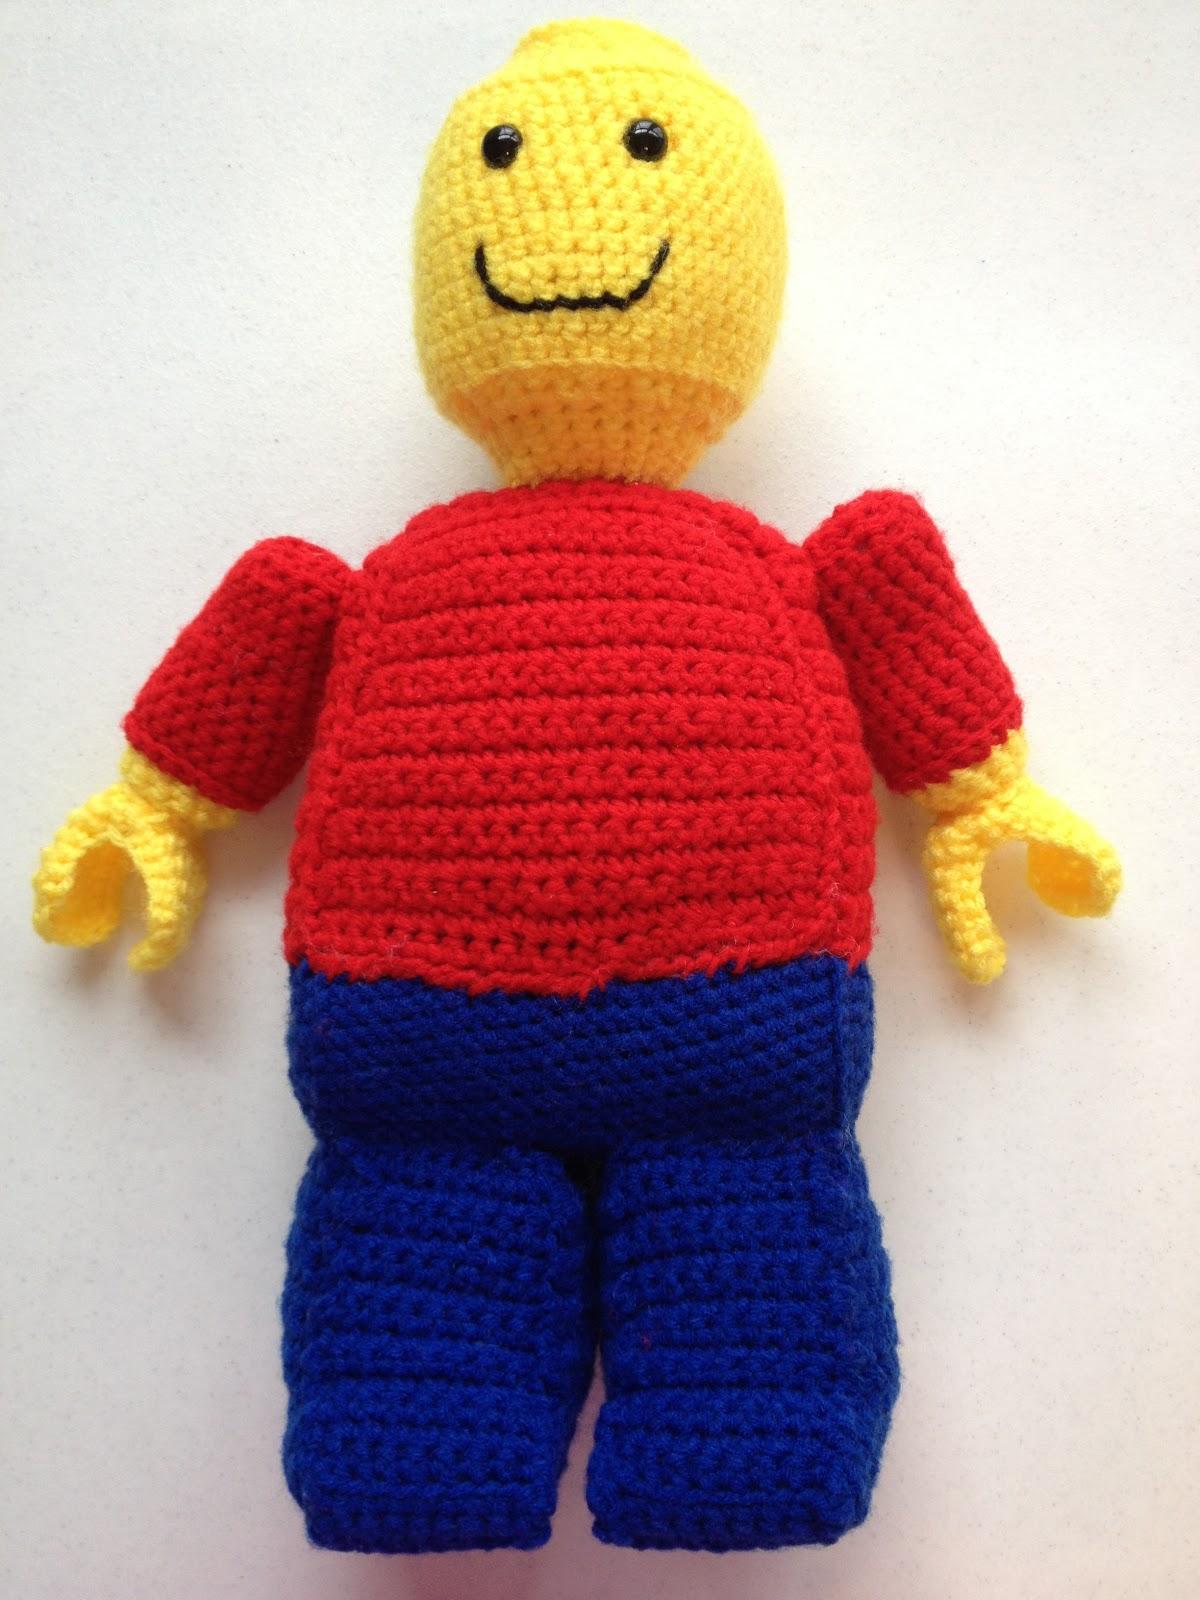 Amigurumi Lego Man : Make ALL The Things!: Christmas Presents: Lego Man